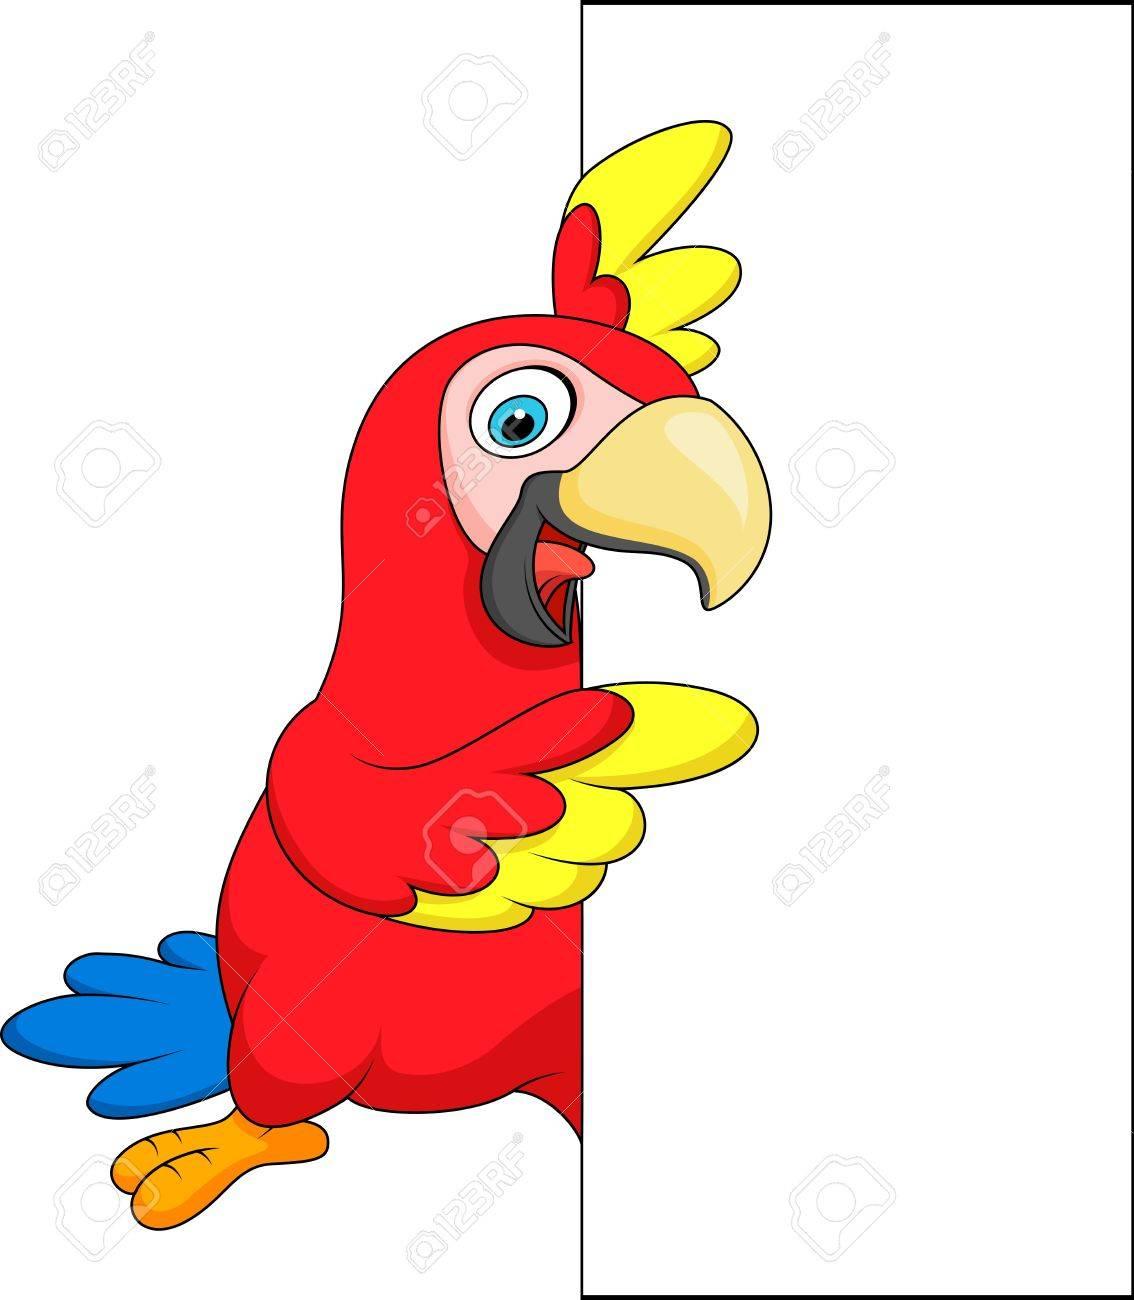 151 412 birds cartoon stock vector illustration and royalty free